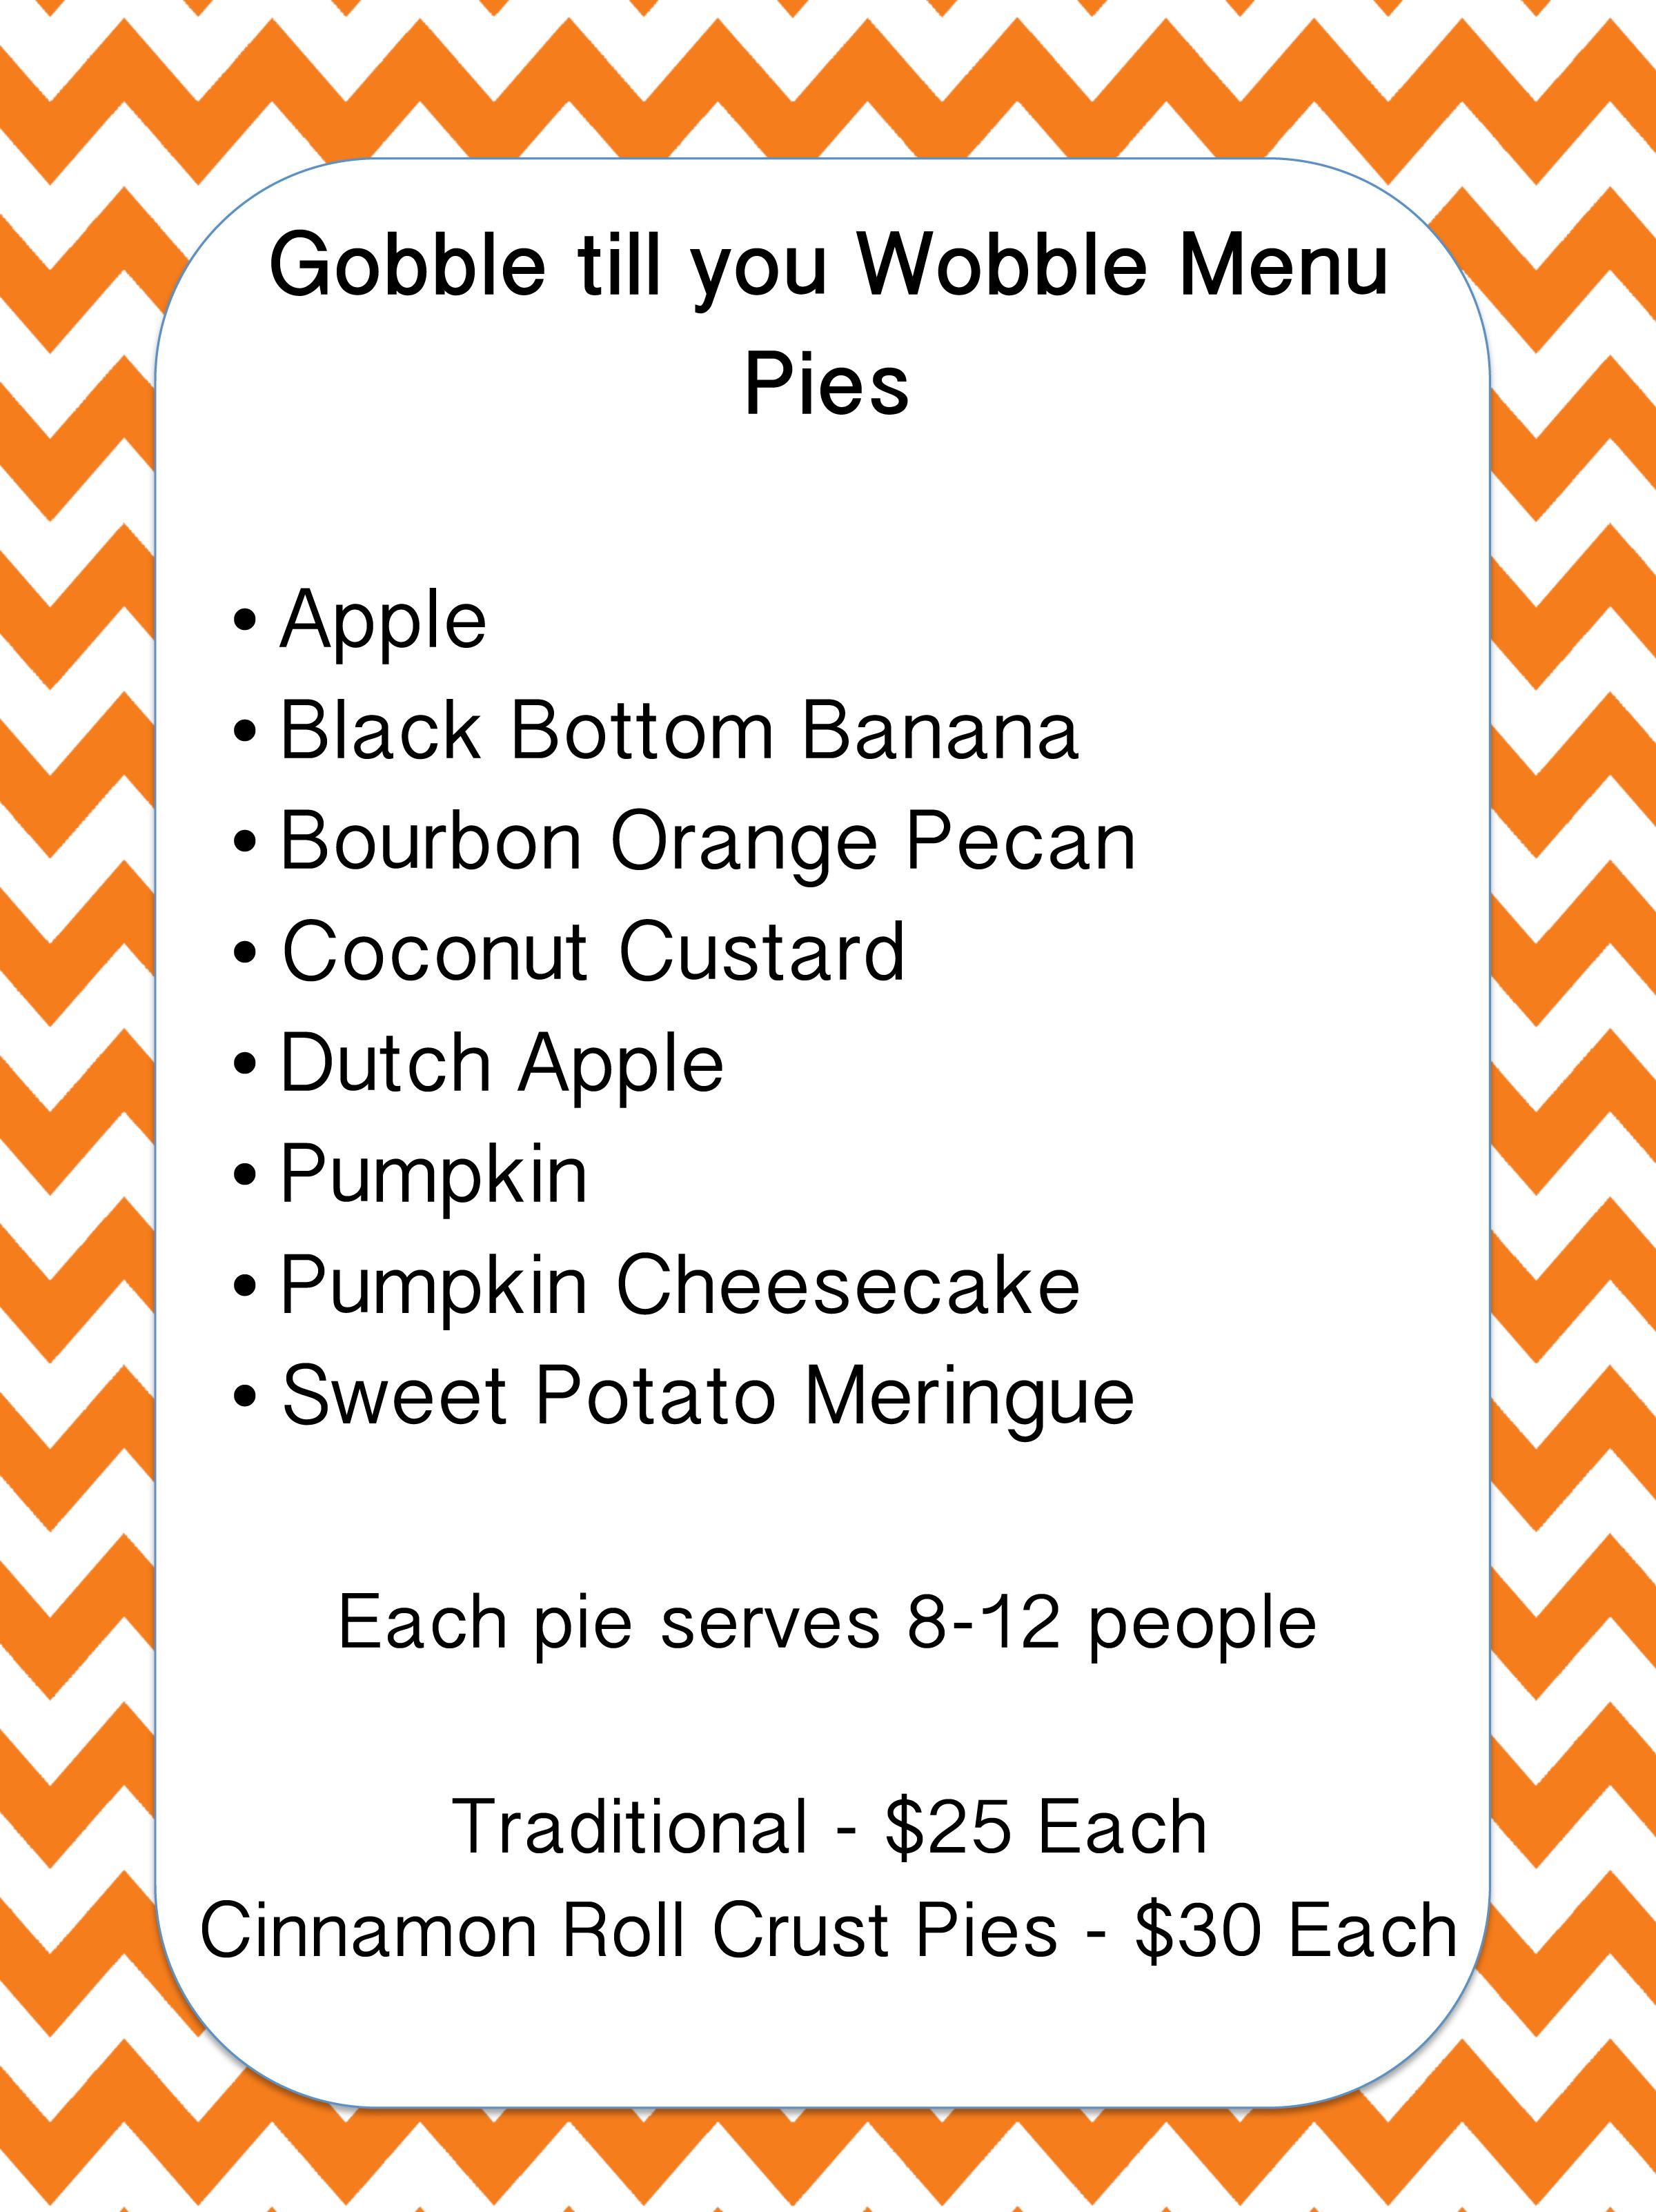 Thanksgiving 2018 Pie Menu.jpg